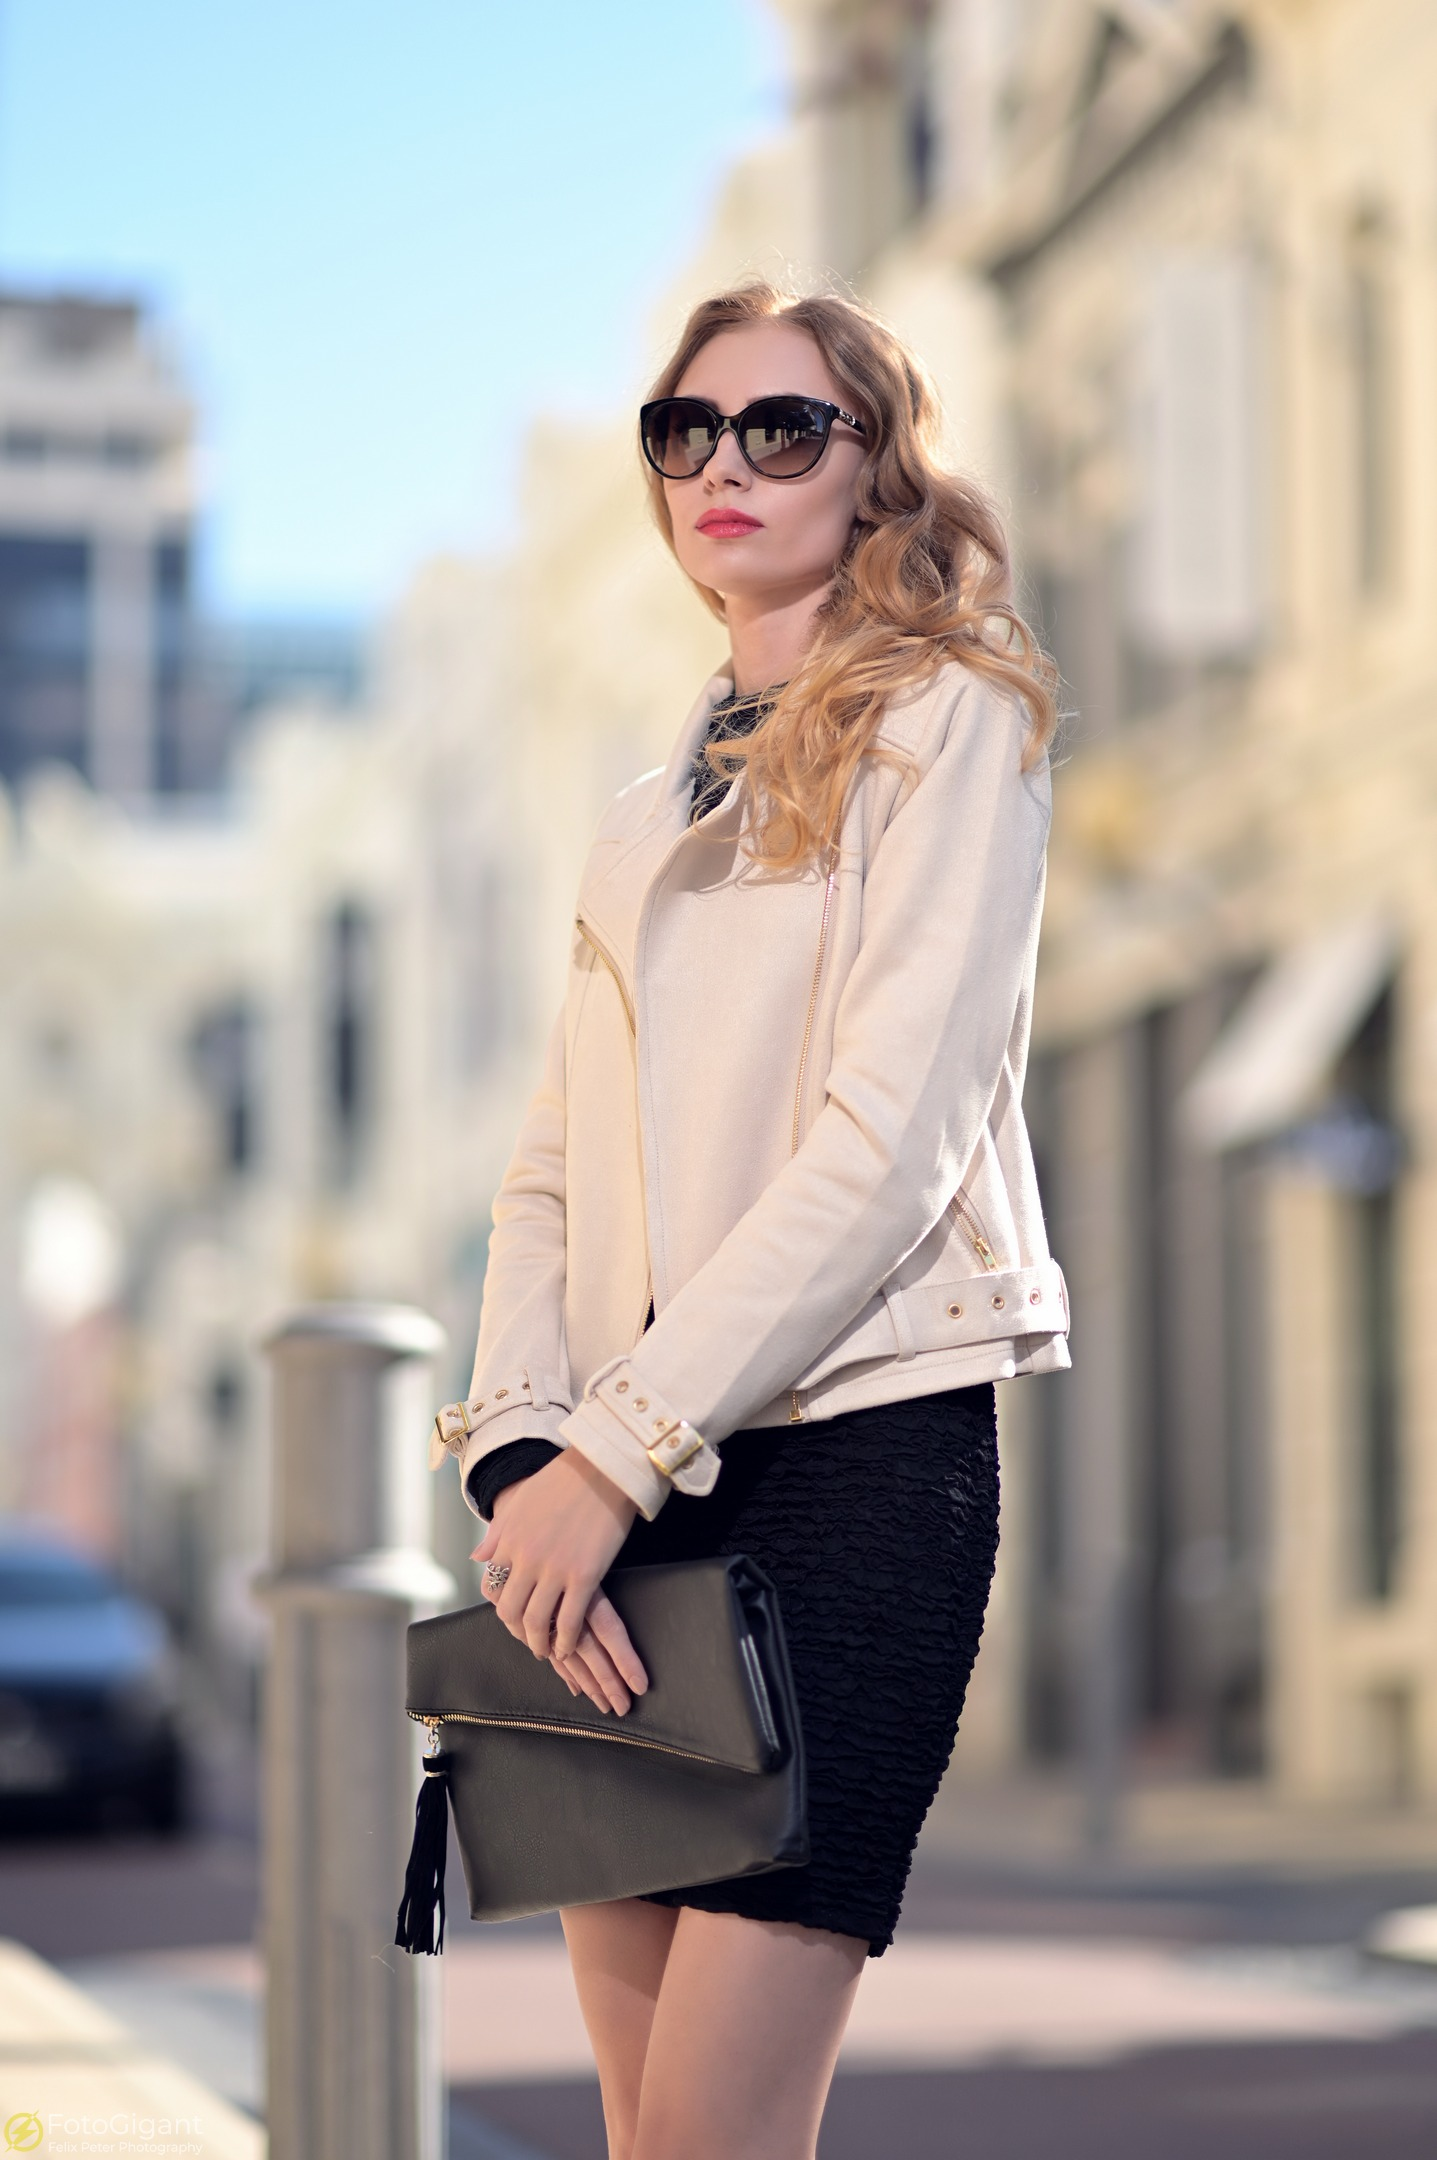 Fashion-Model-Photography_International_01.jpg